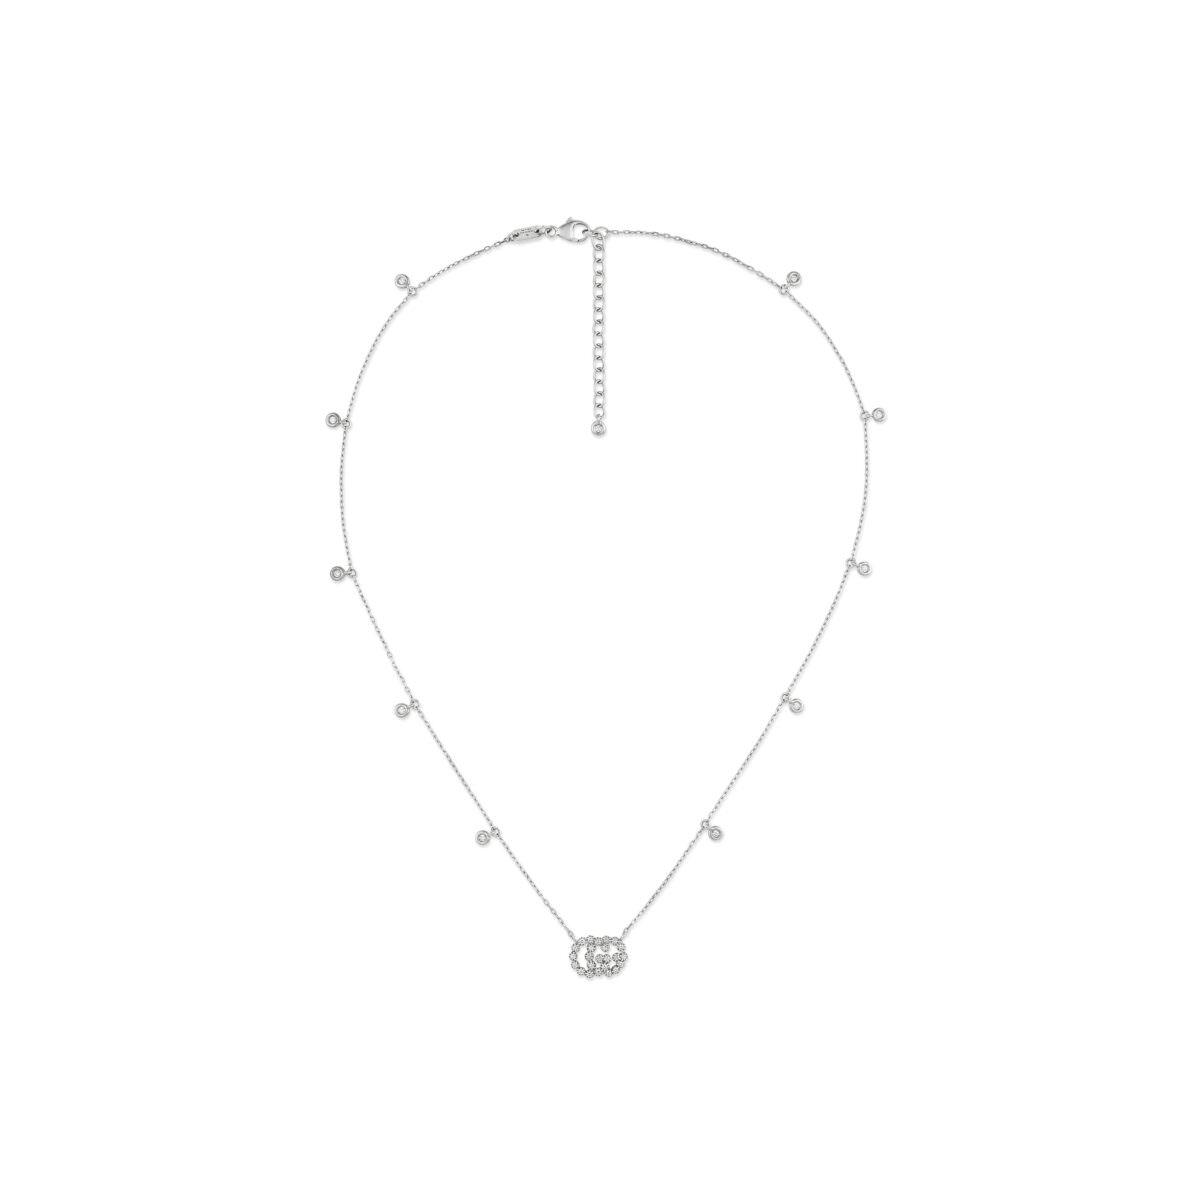 Collana GG Running 18 carati con diamanti